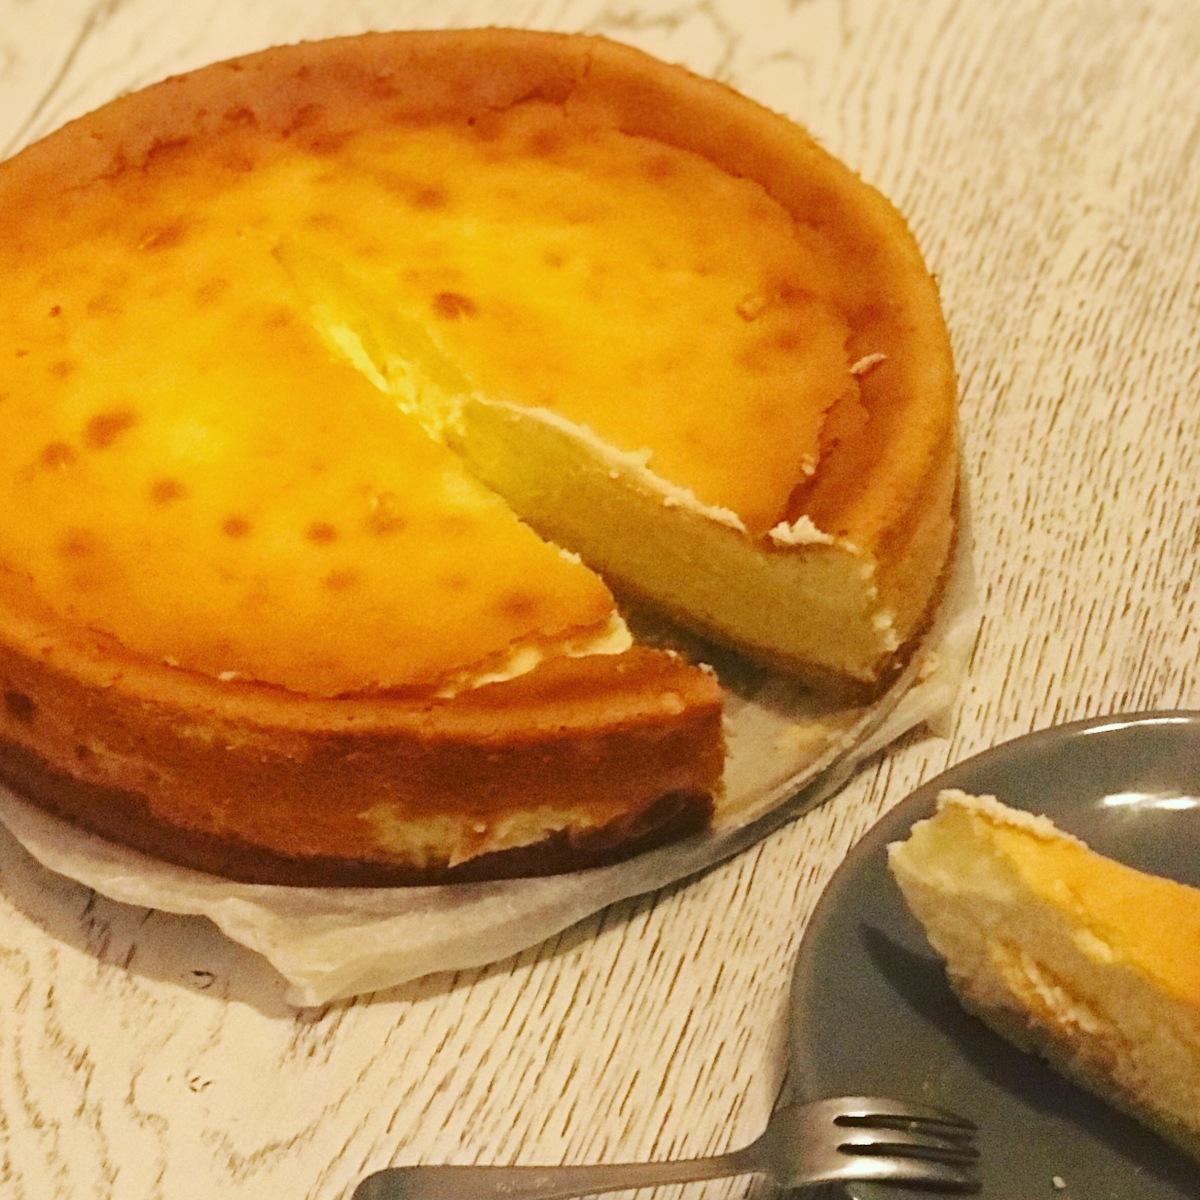 Perfecte Baked Cheesecake a la Miljuschka